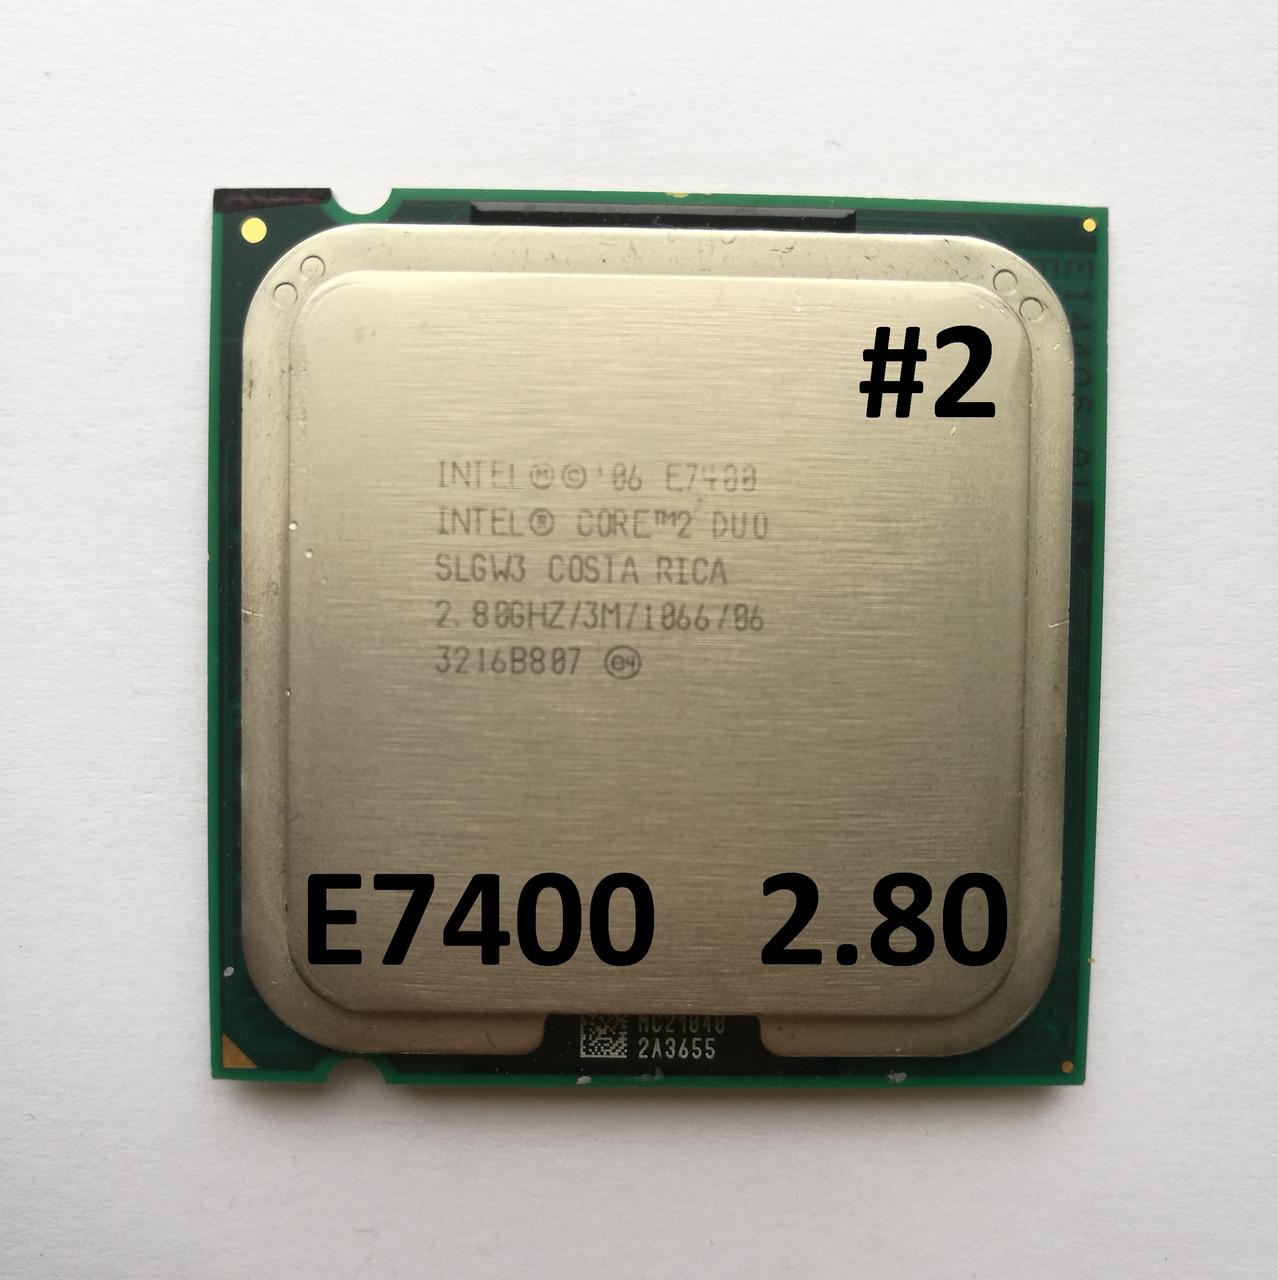 Процессор ЛОТ#2 Intel® Core™2 Duo E7400 R0 SLB9Y 2.80GHz 3M Cache 1066 MHz FSB Socket 775 Б/У